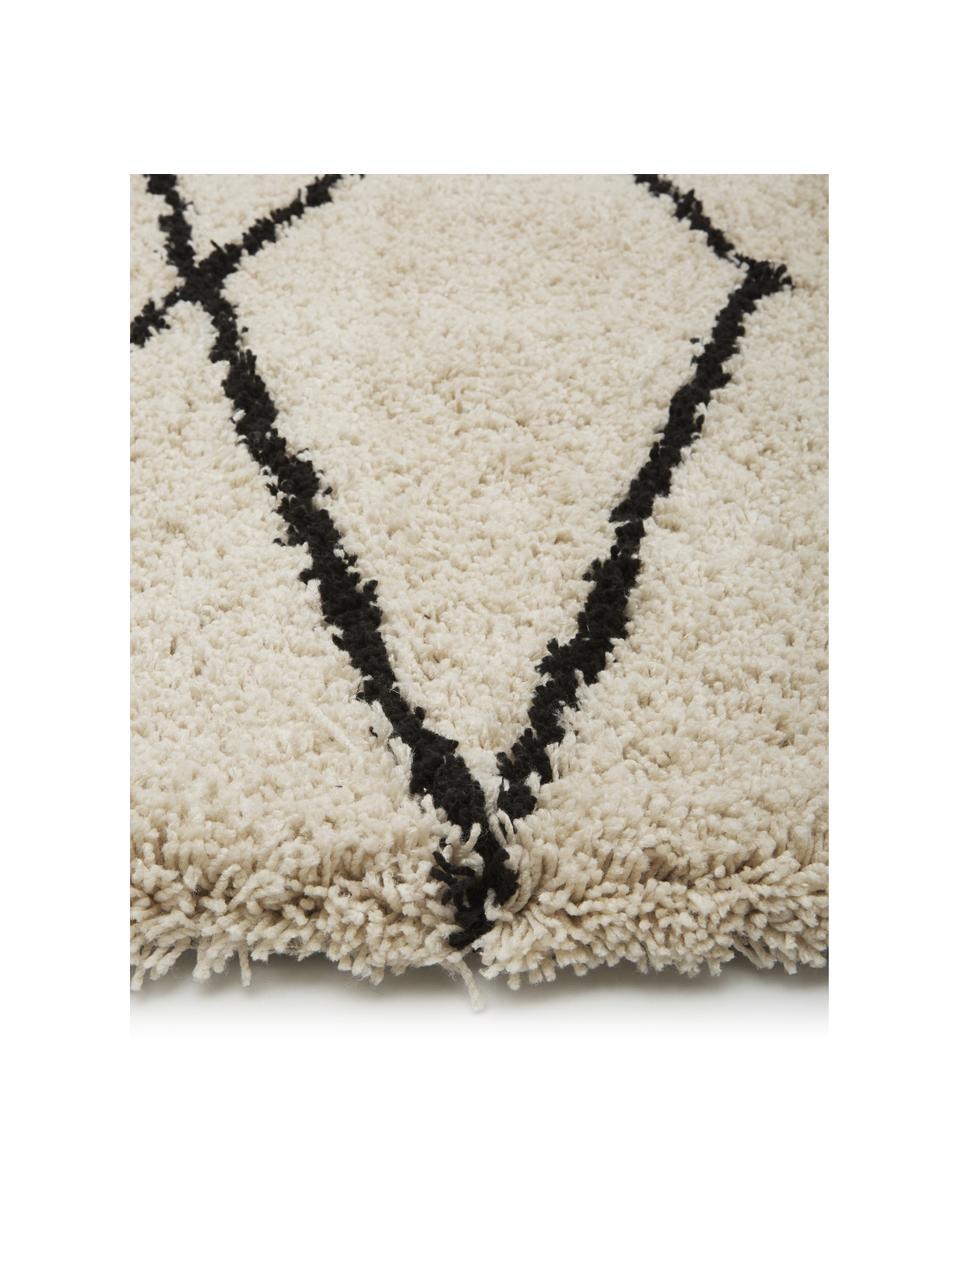 Passatoia a pelo lungo taftata a mano Naima, Retro: 100% cotone, Beige, nero, Larg. 80 x Lung. 300 cm